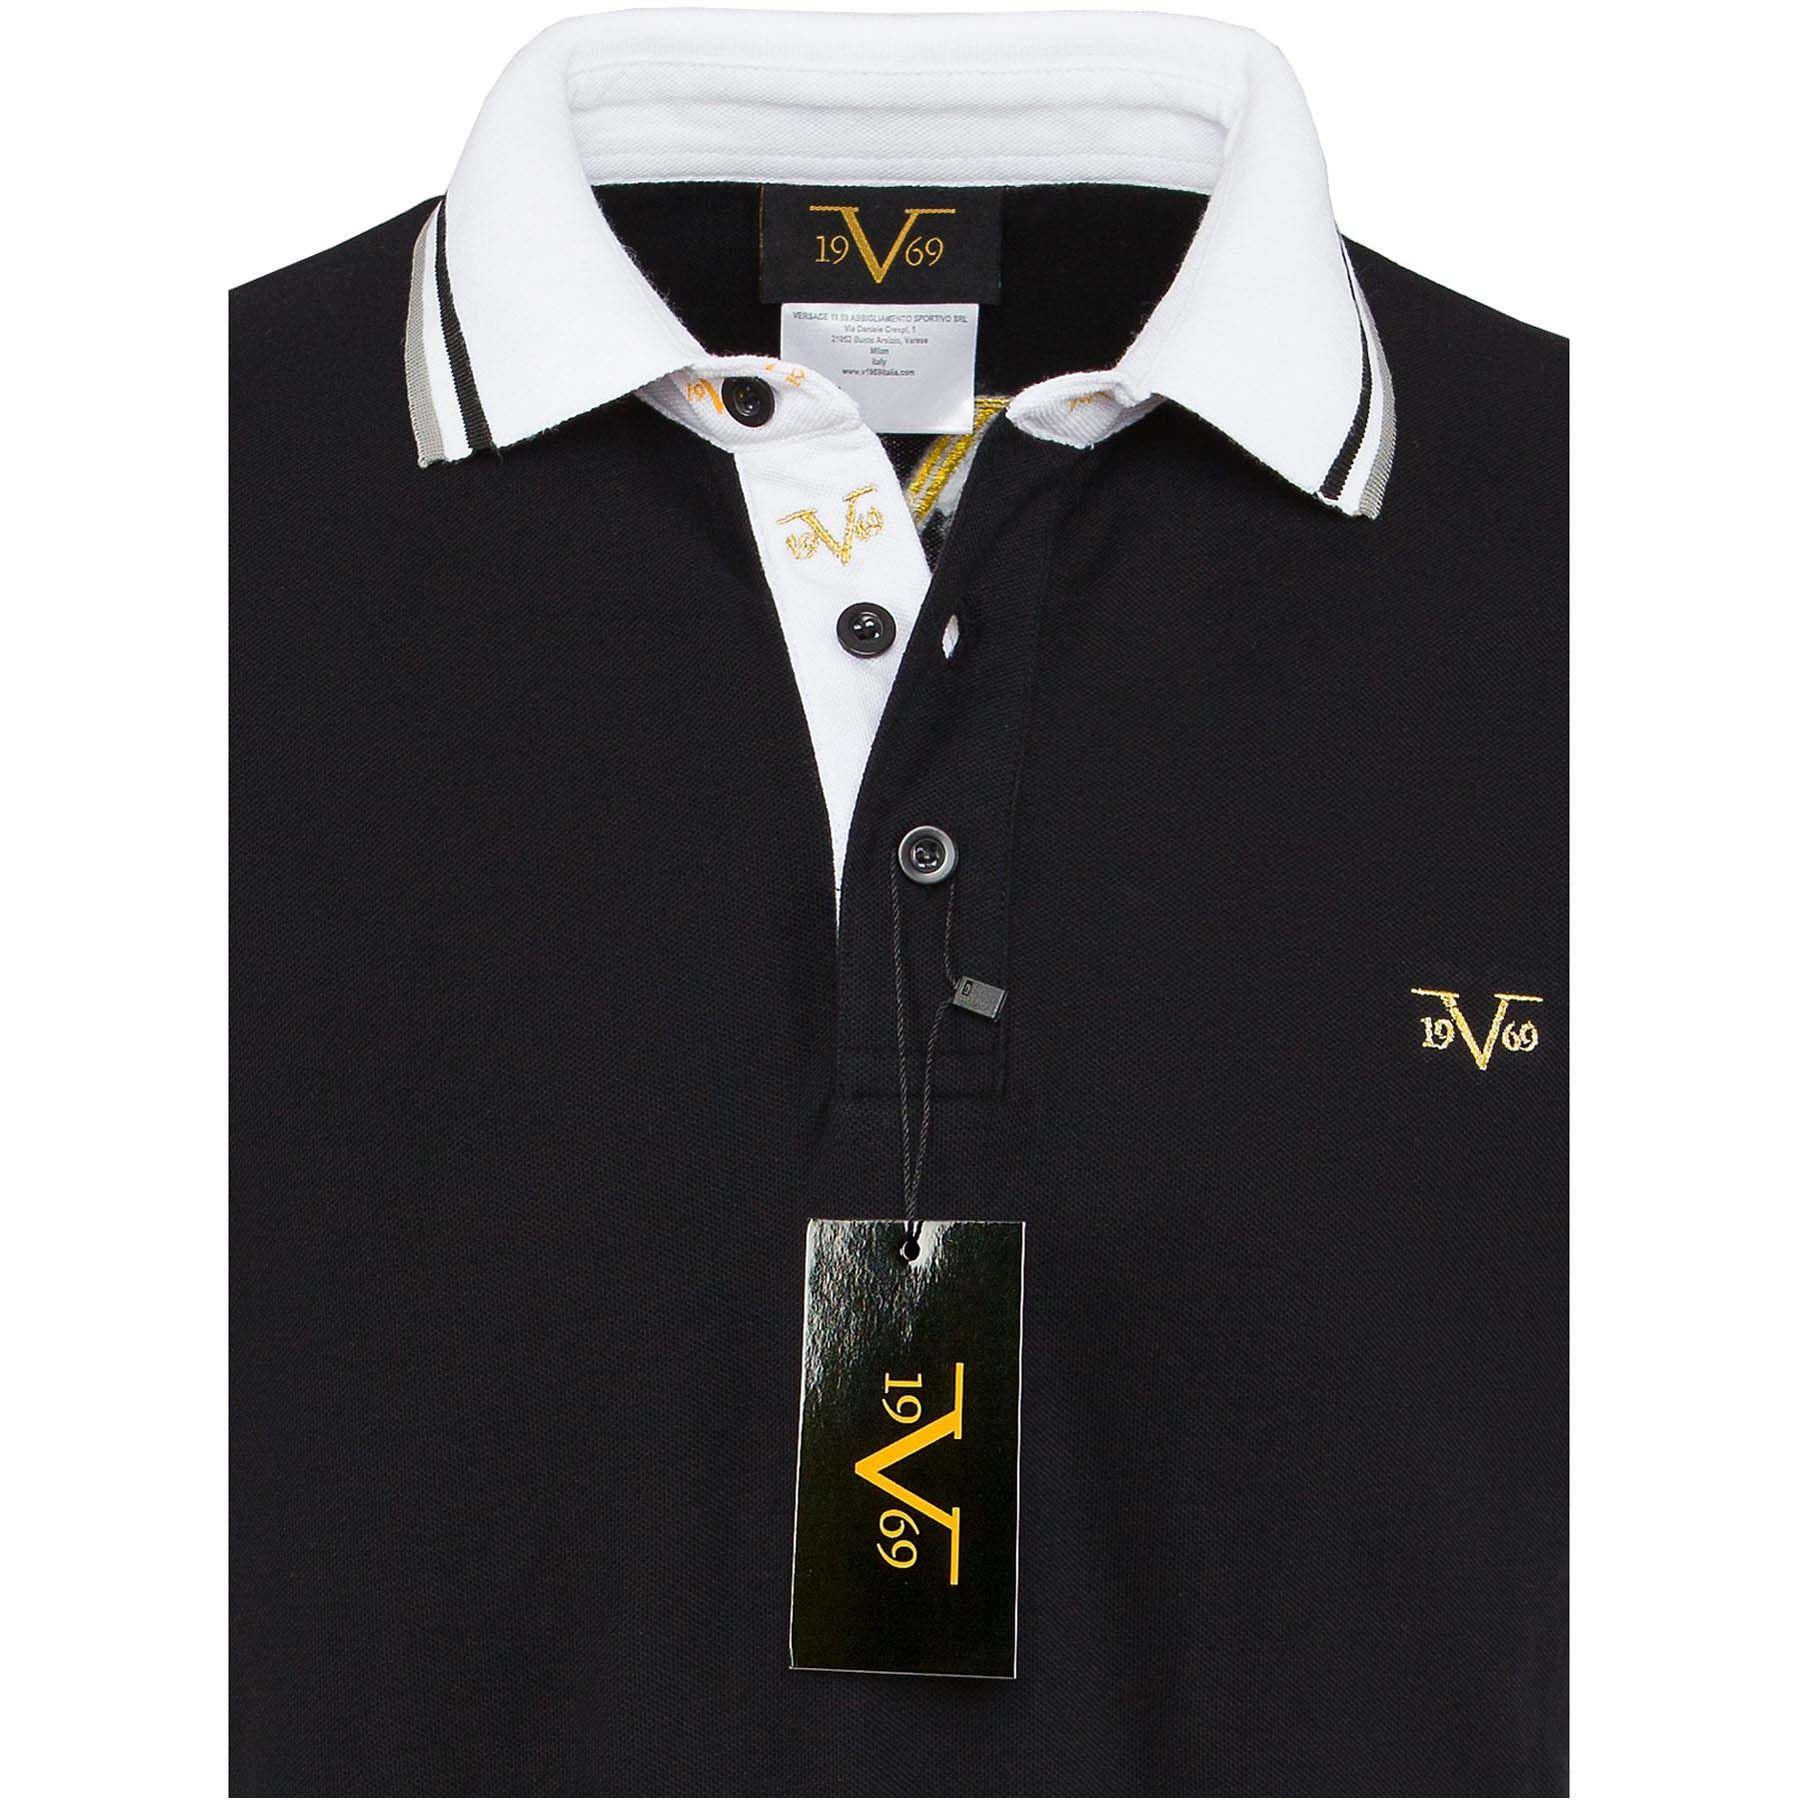 2a854e37 Polo shirt men M black